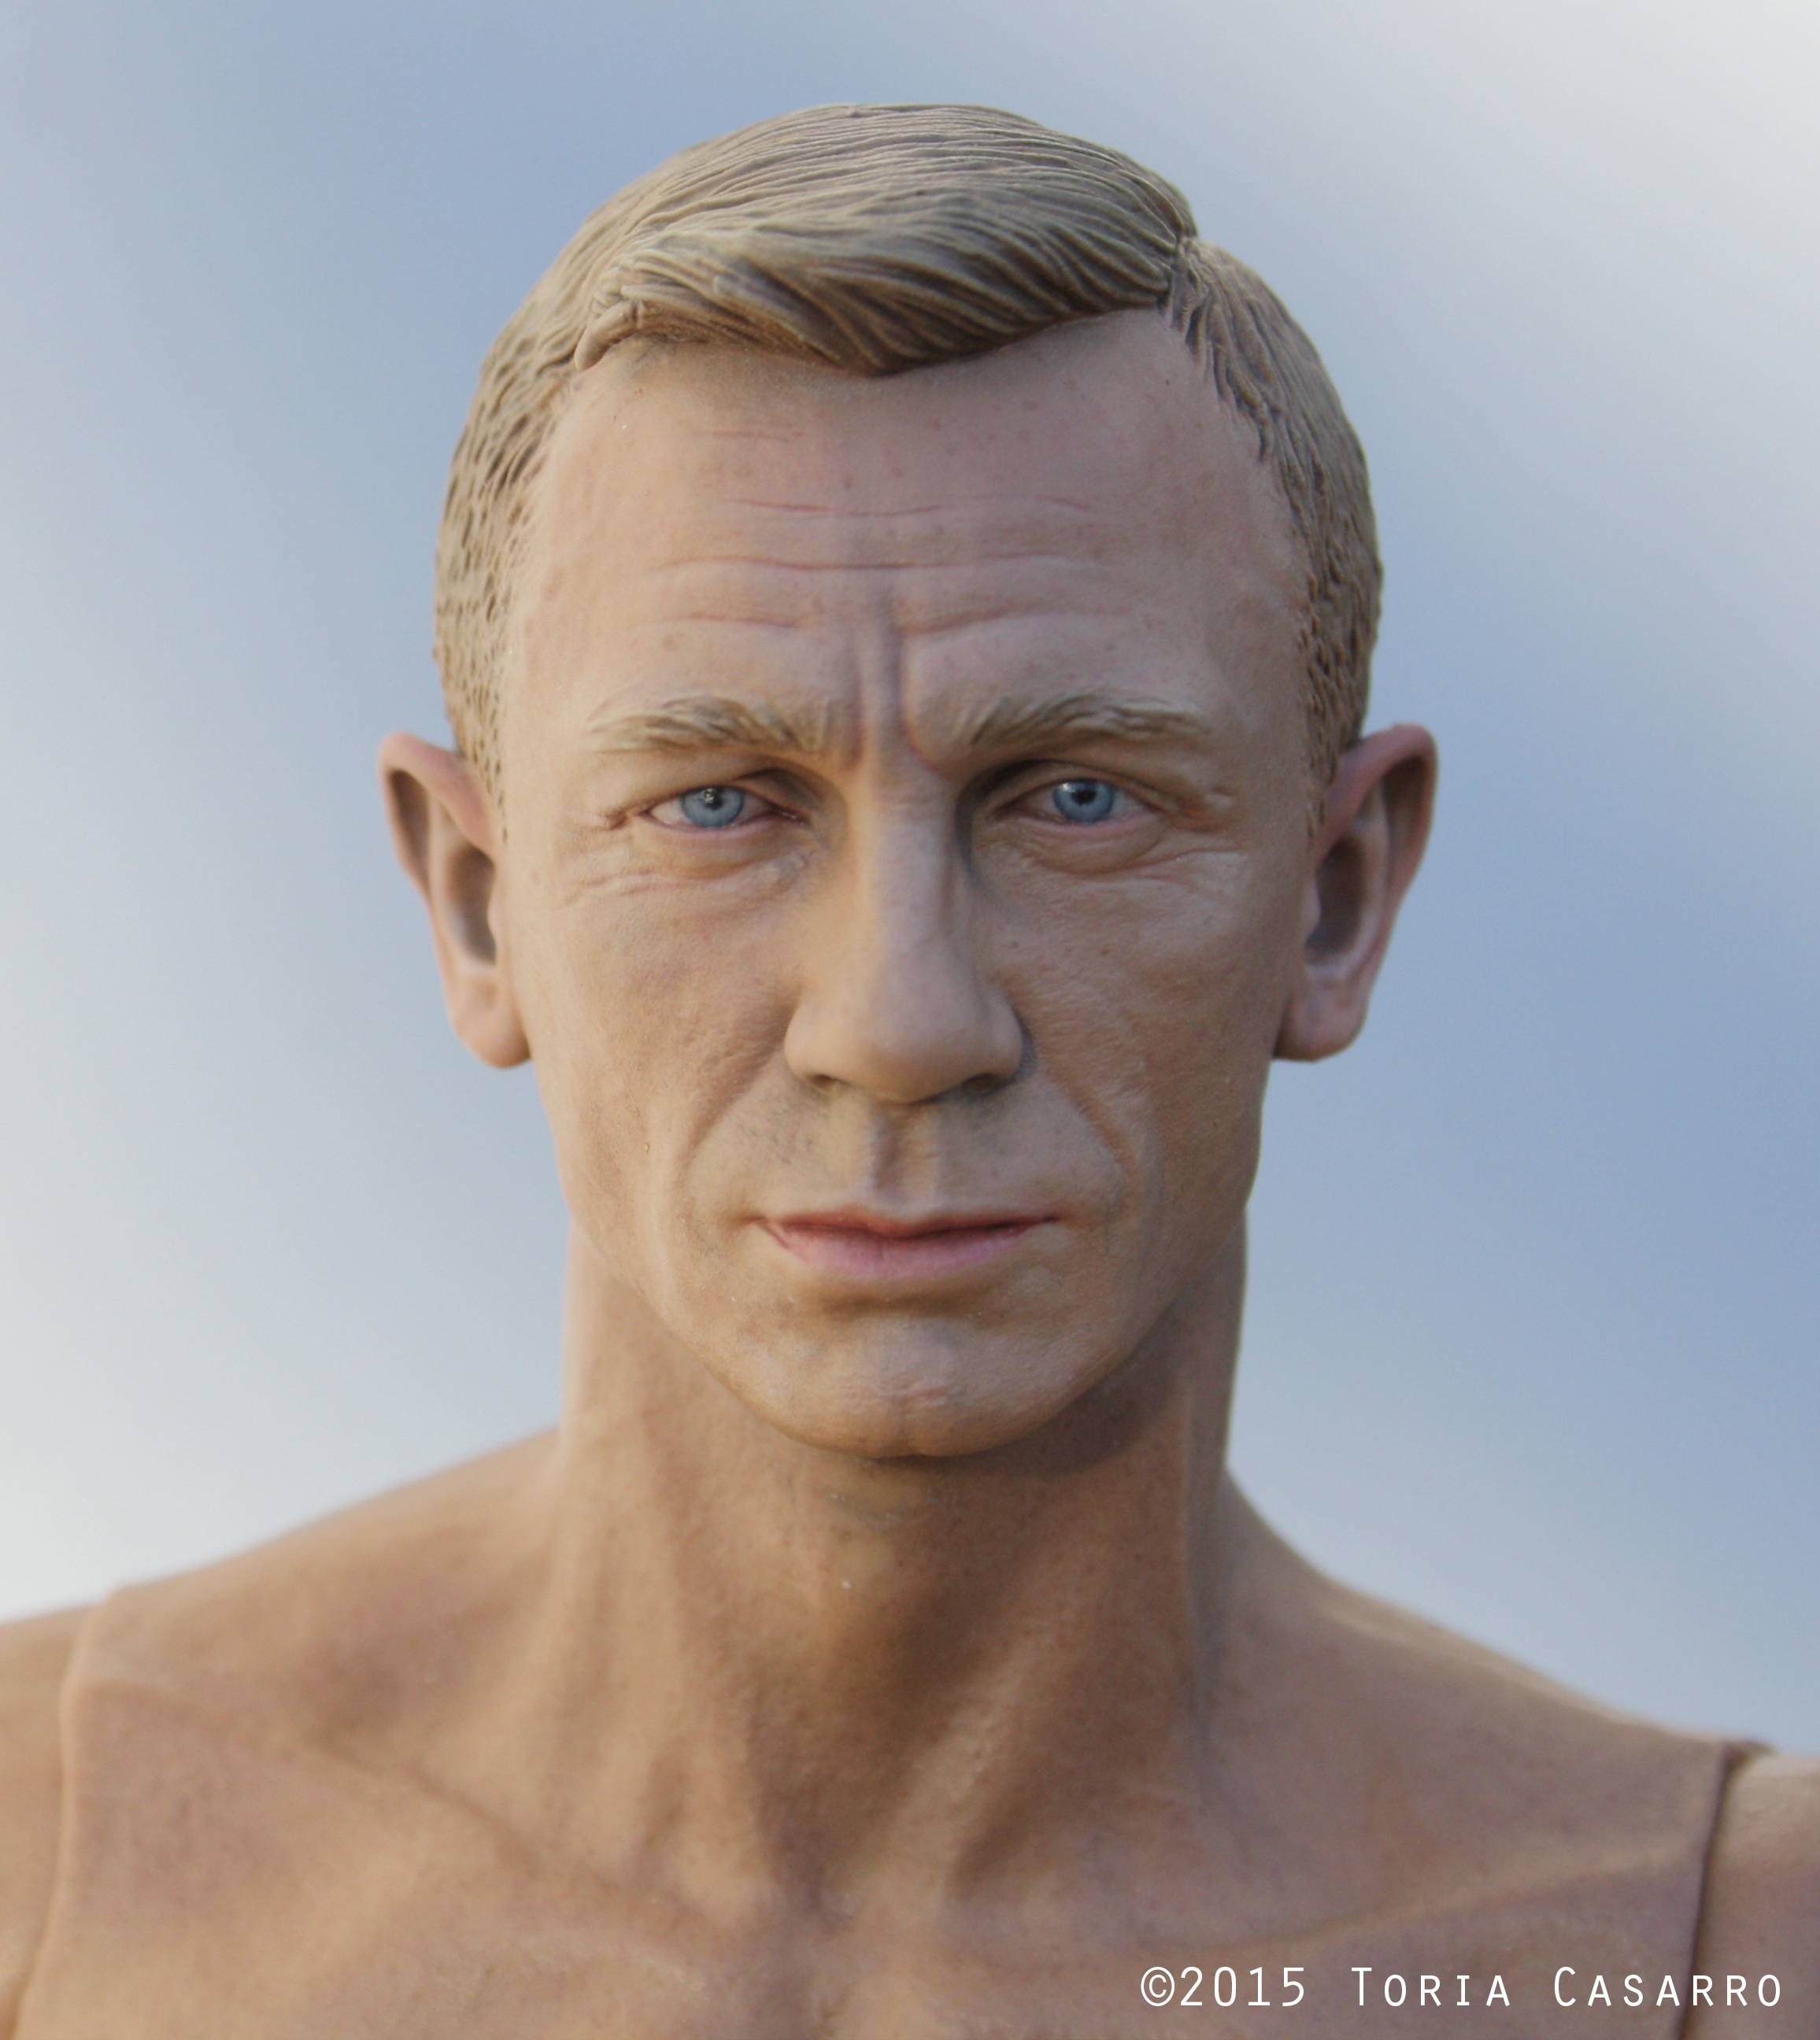 1/6th scale Daniel Craig sejak Toria Casarro